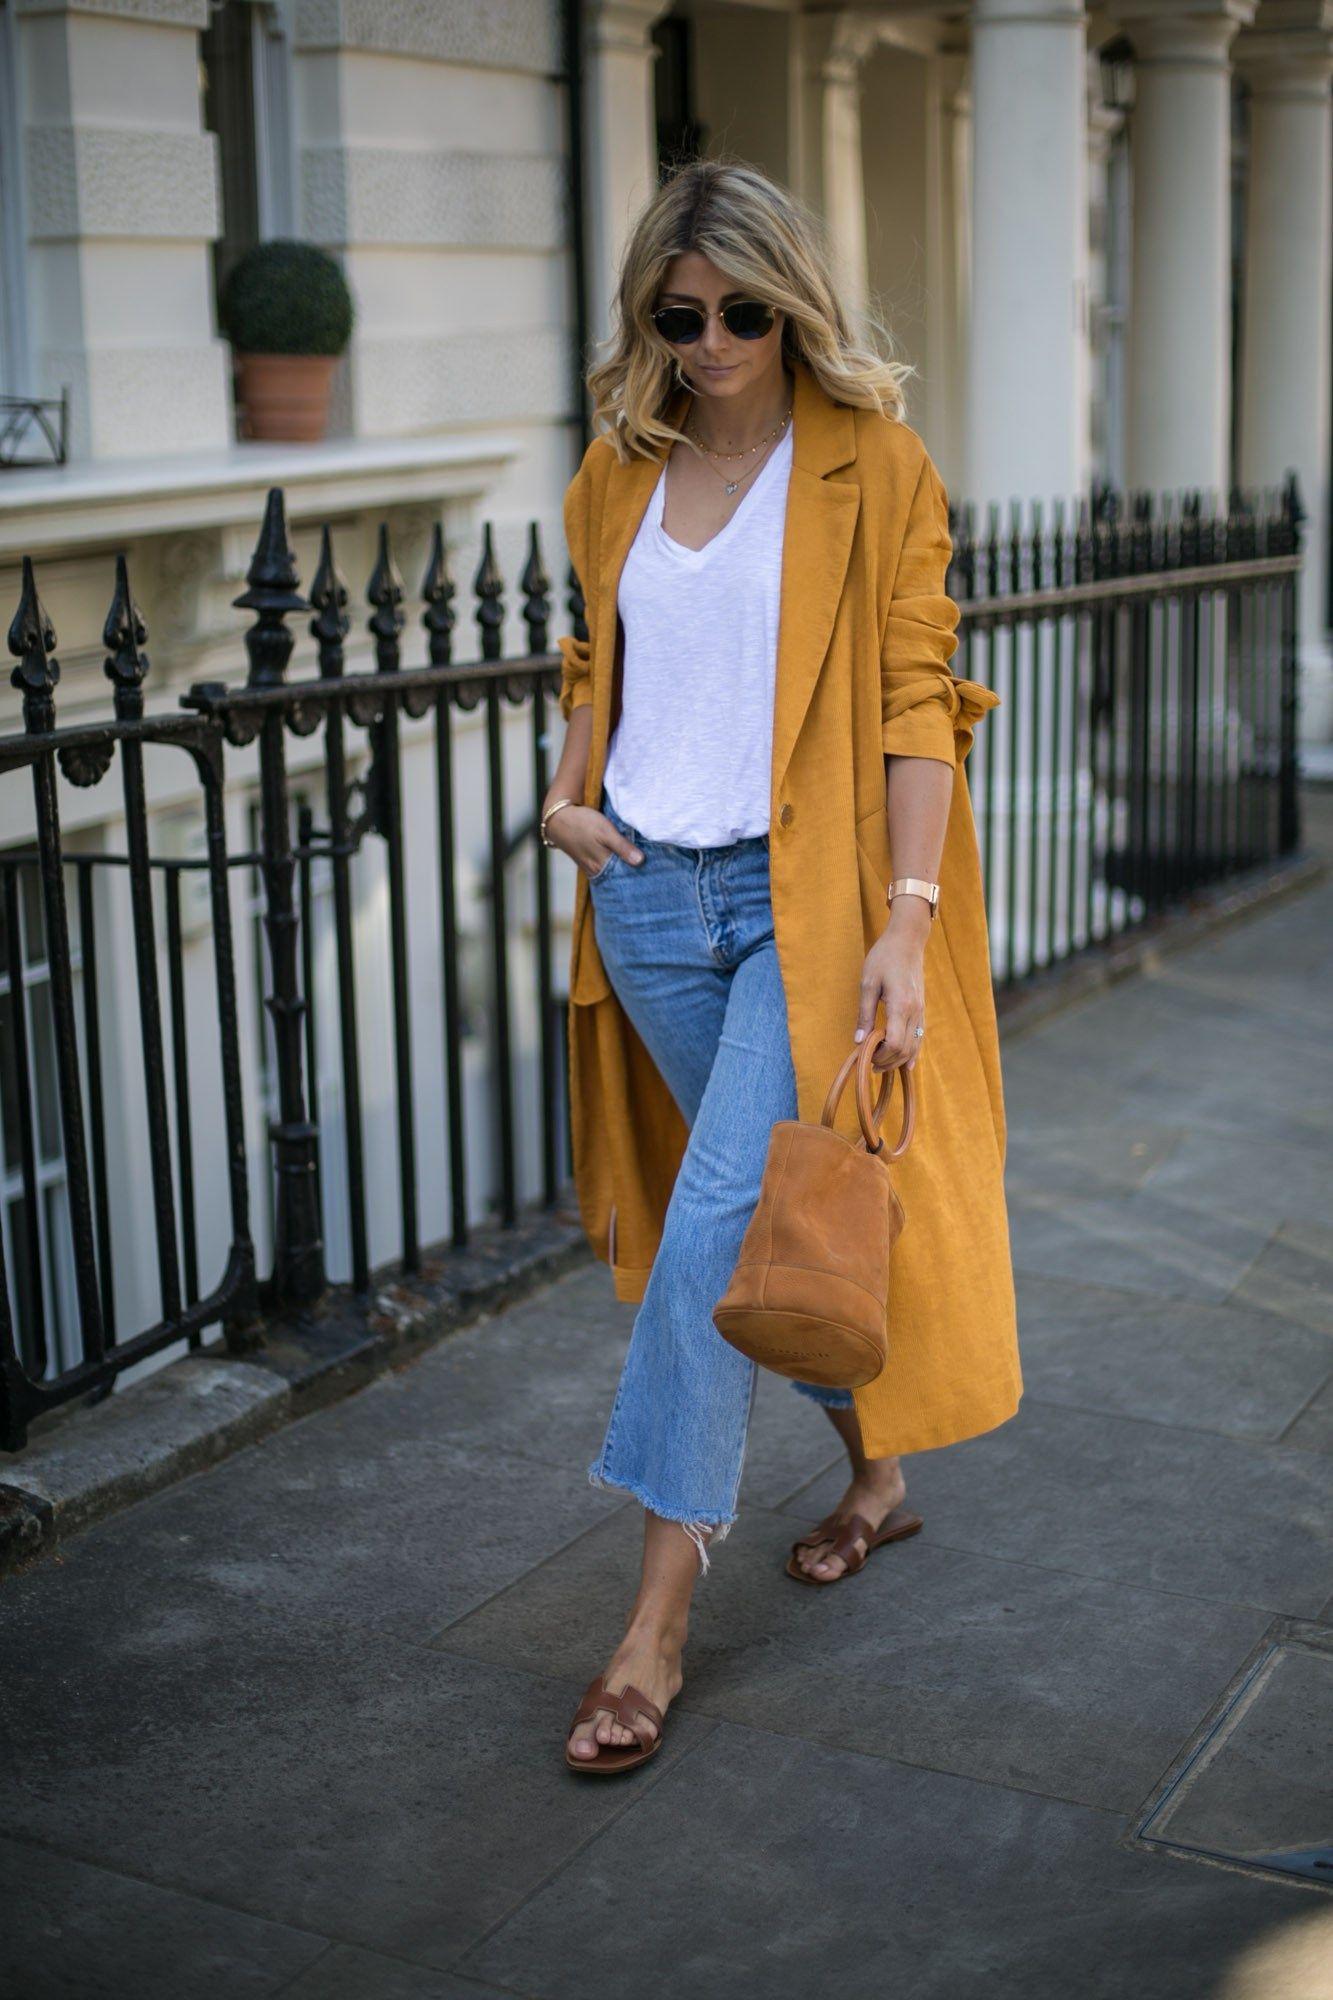 e94193e04de Emma Hill wears Mustard duster coat, cropped frayed jeans, Hermes Oran tan  leather sandals, basic white t shirt, Simon Miller Bonsai bag, summer outfit